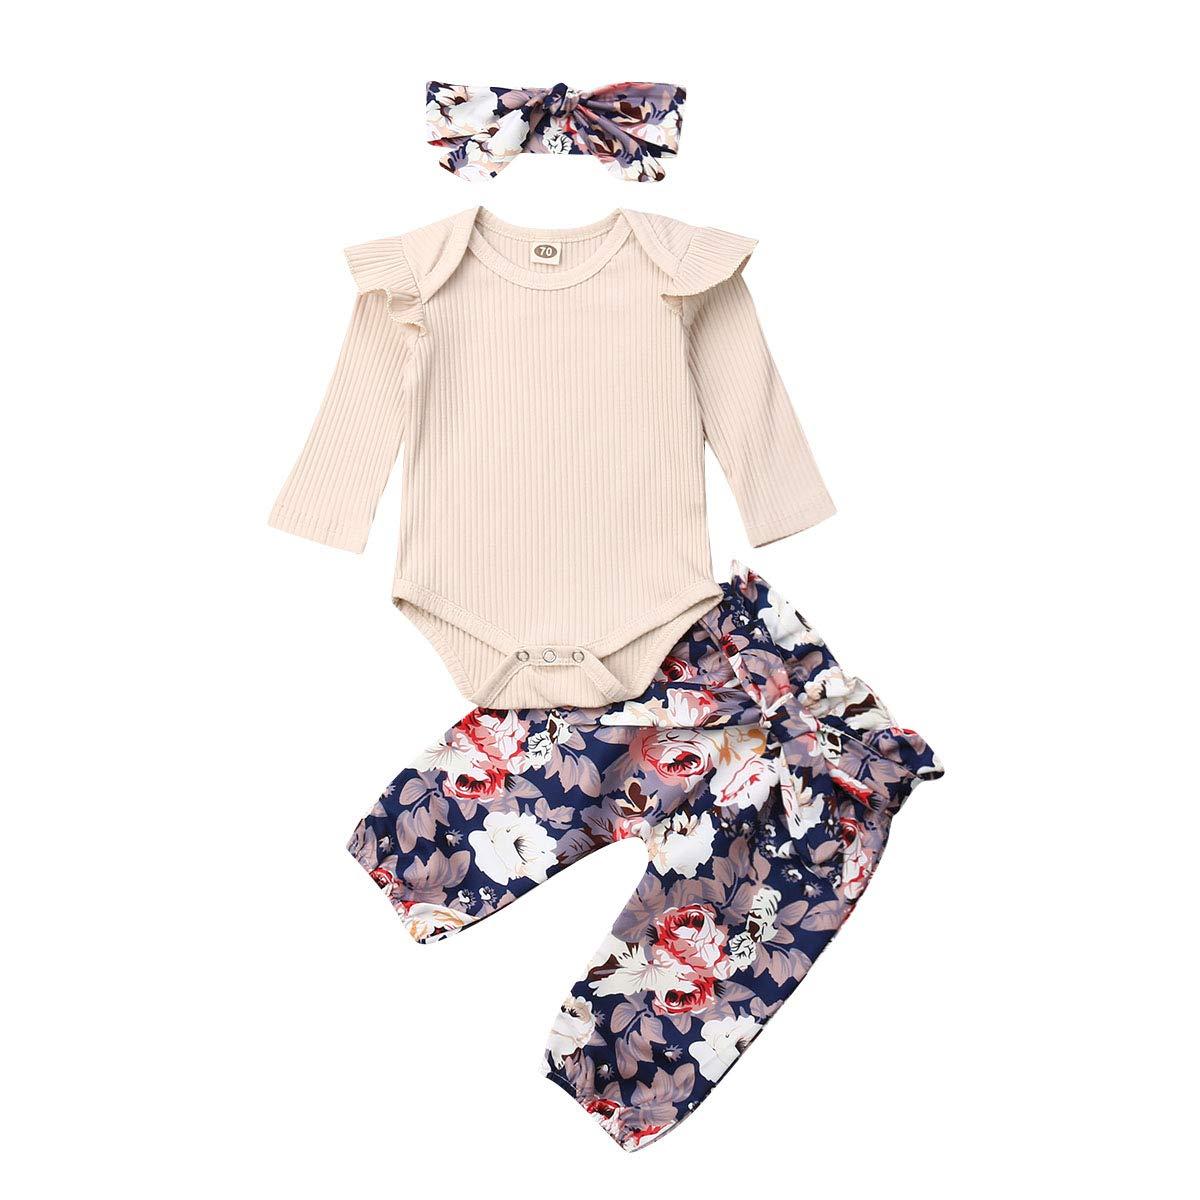 3PCS Newborn Baby Girls Ruffle Collar Romper Bodysuit Floral Long Pants Headband Outfits Set